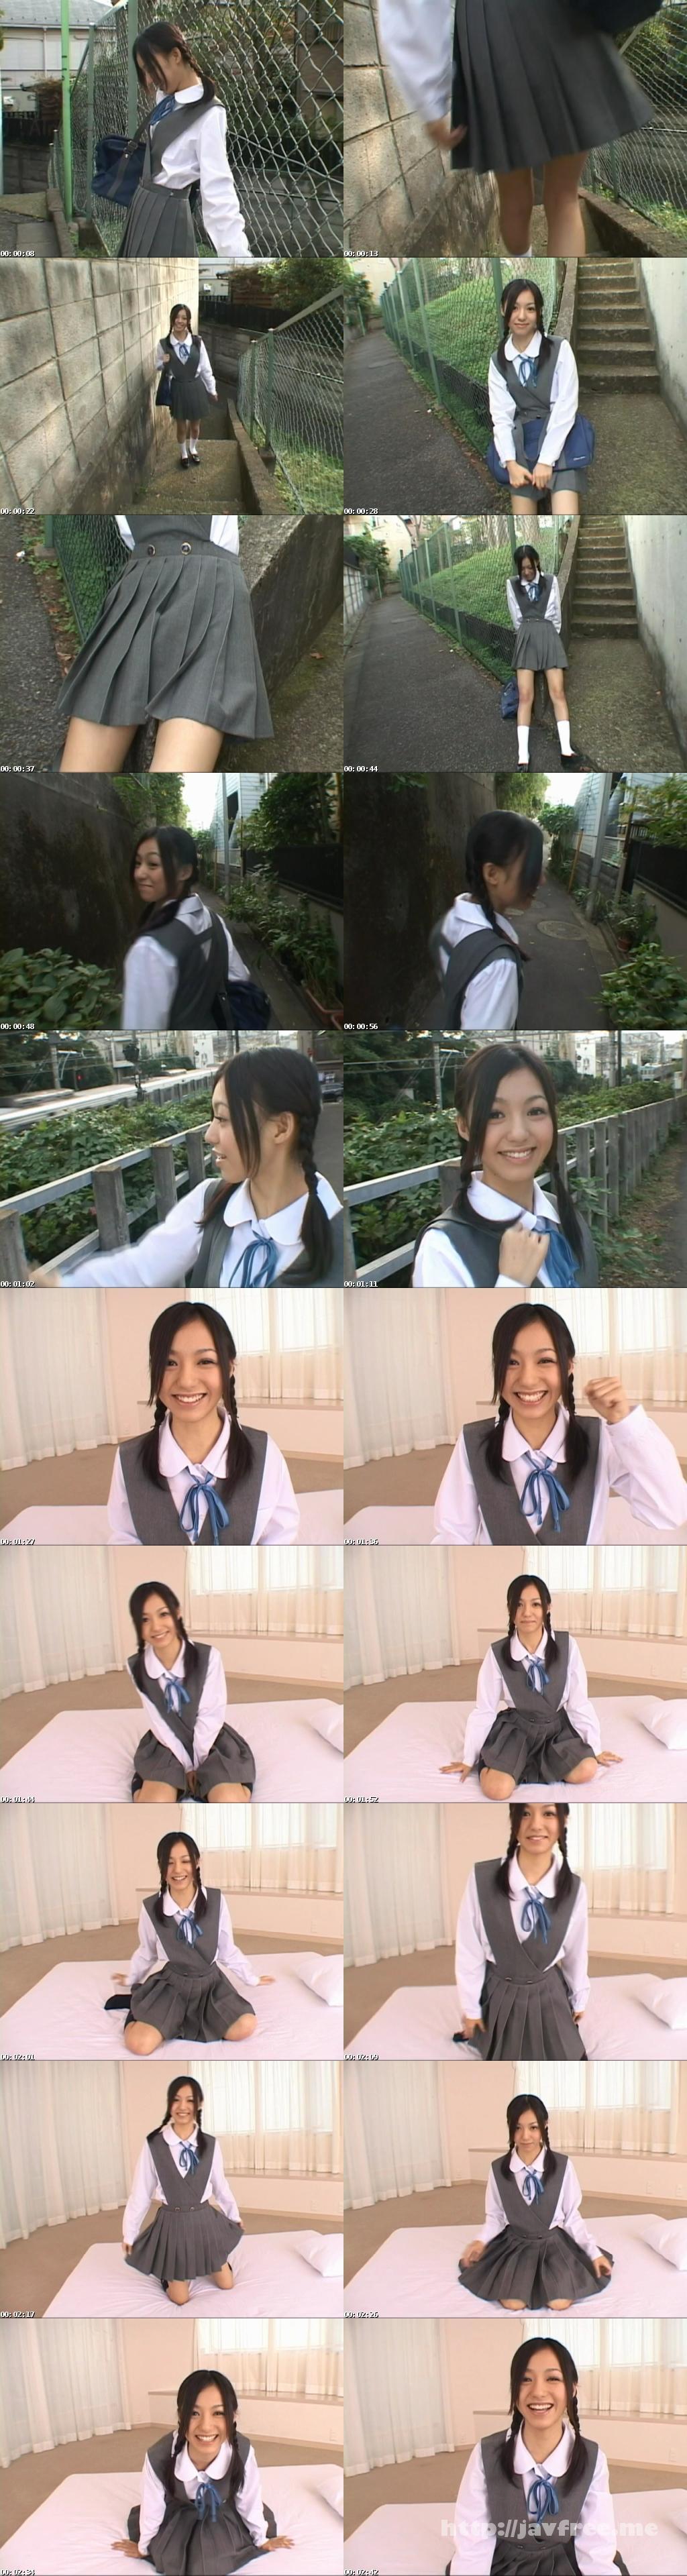 MRMM-022  【復刻版】School days 希志あいの 希志あいの MRMM